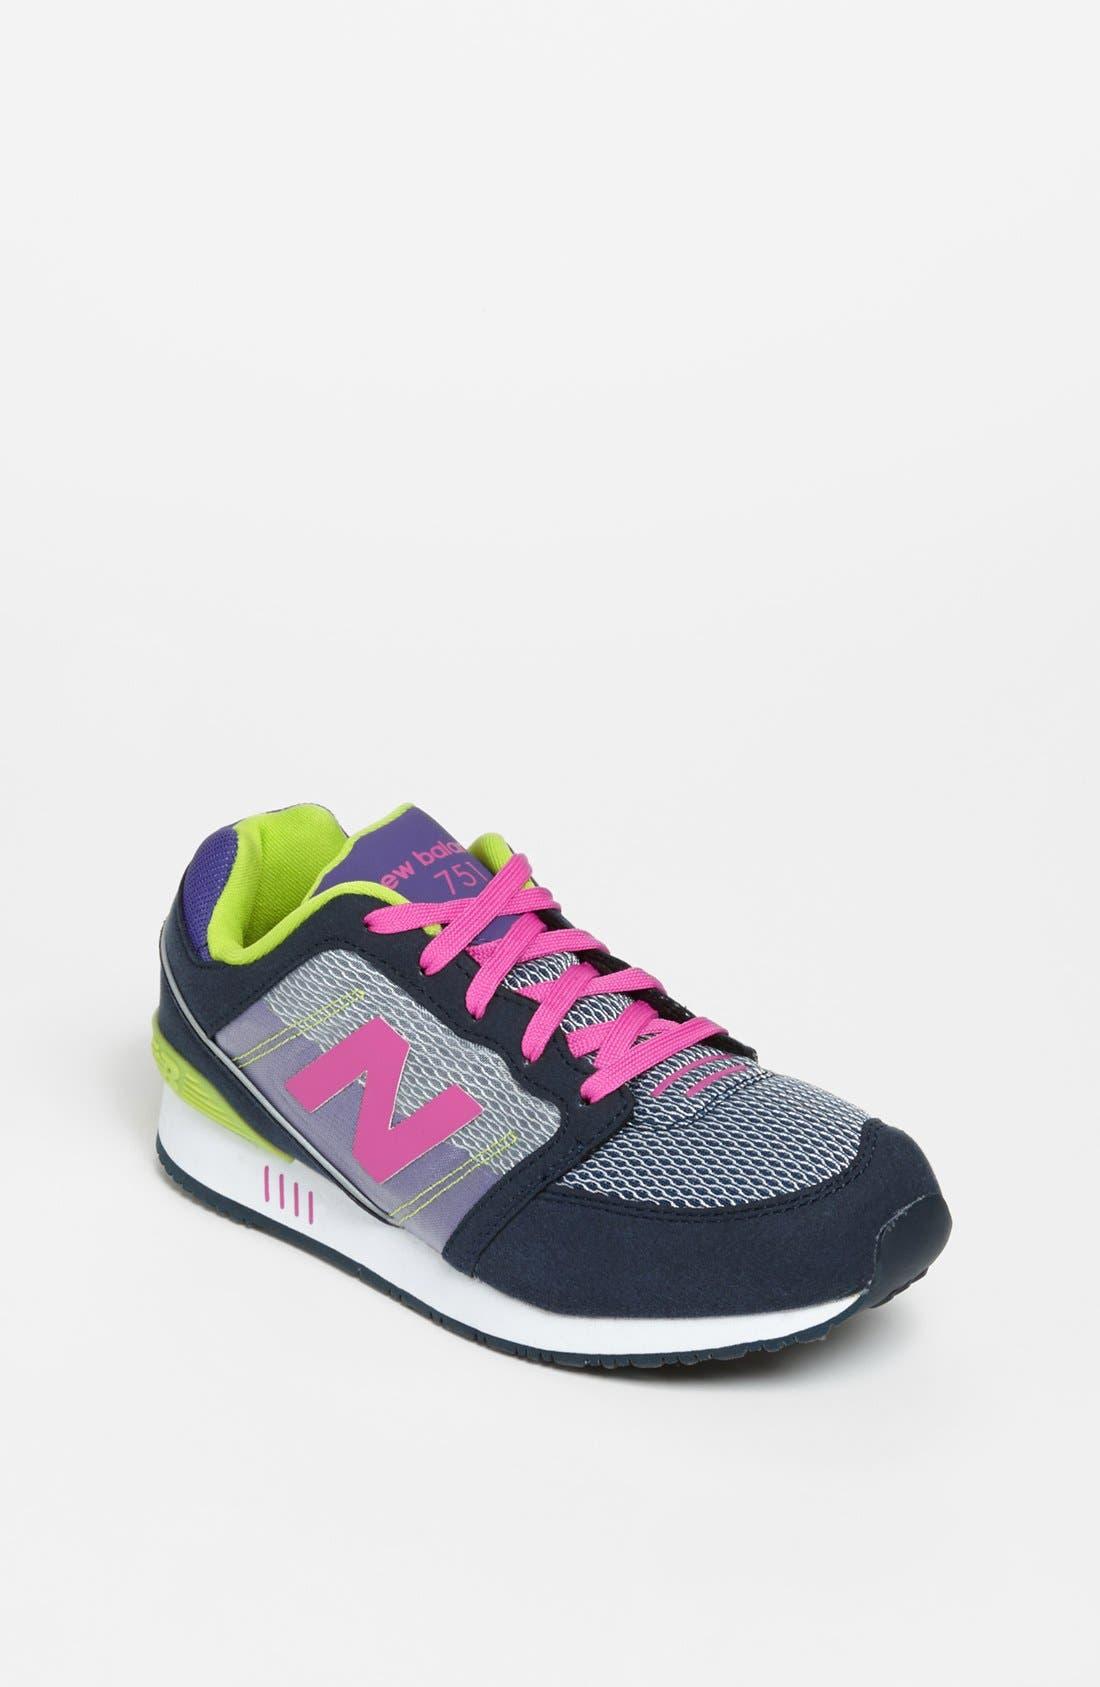 Alternate Image 1 Selected - New Balance 'ML574' Sneaker (Little Kid & Big Kid)